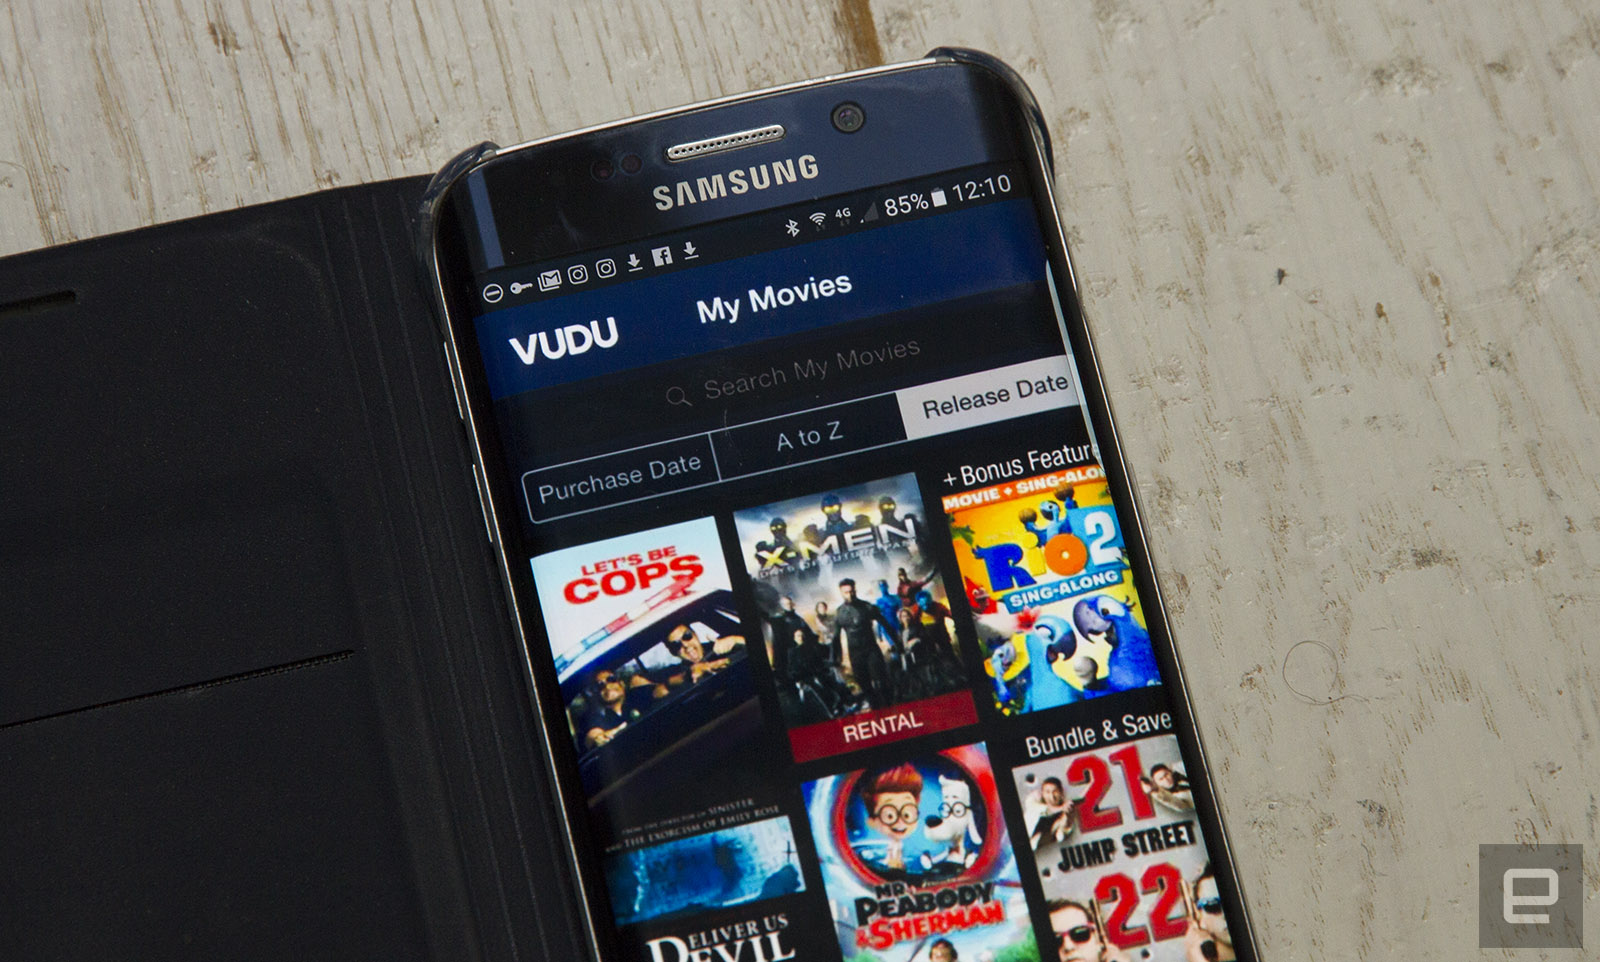 Vudu's mobile app rips digital copies of your Blu-rays